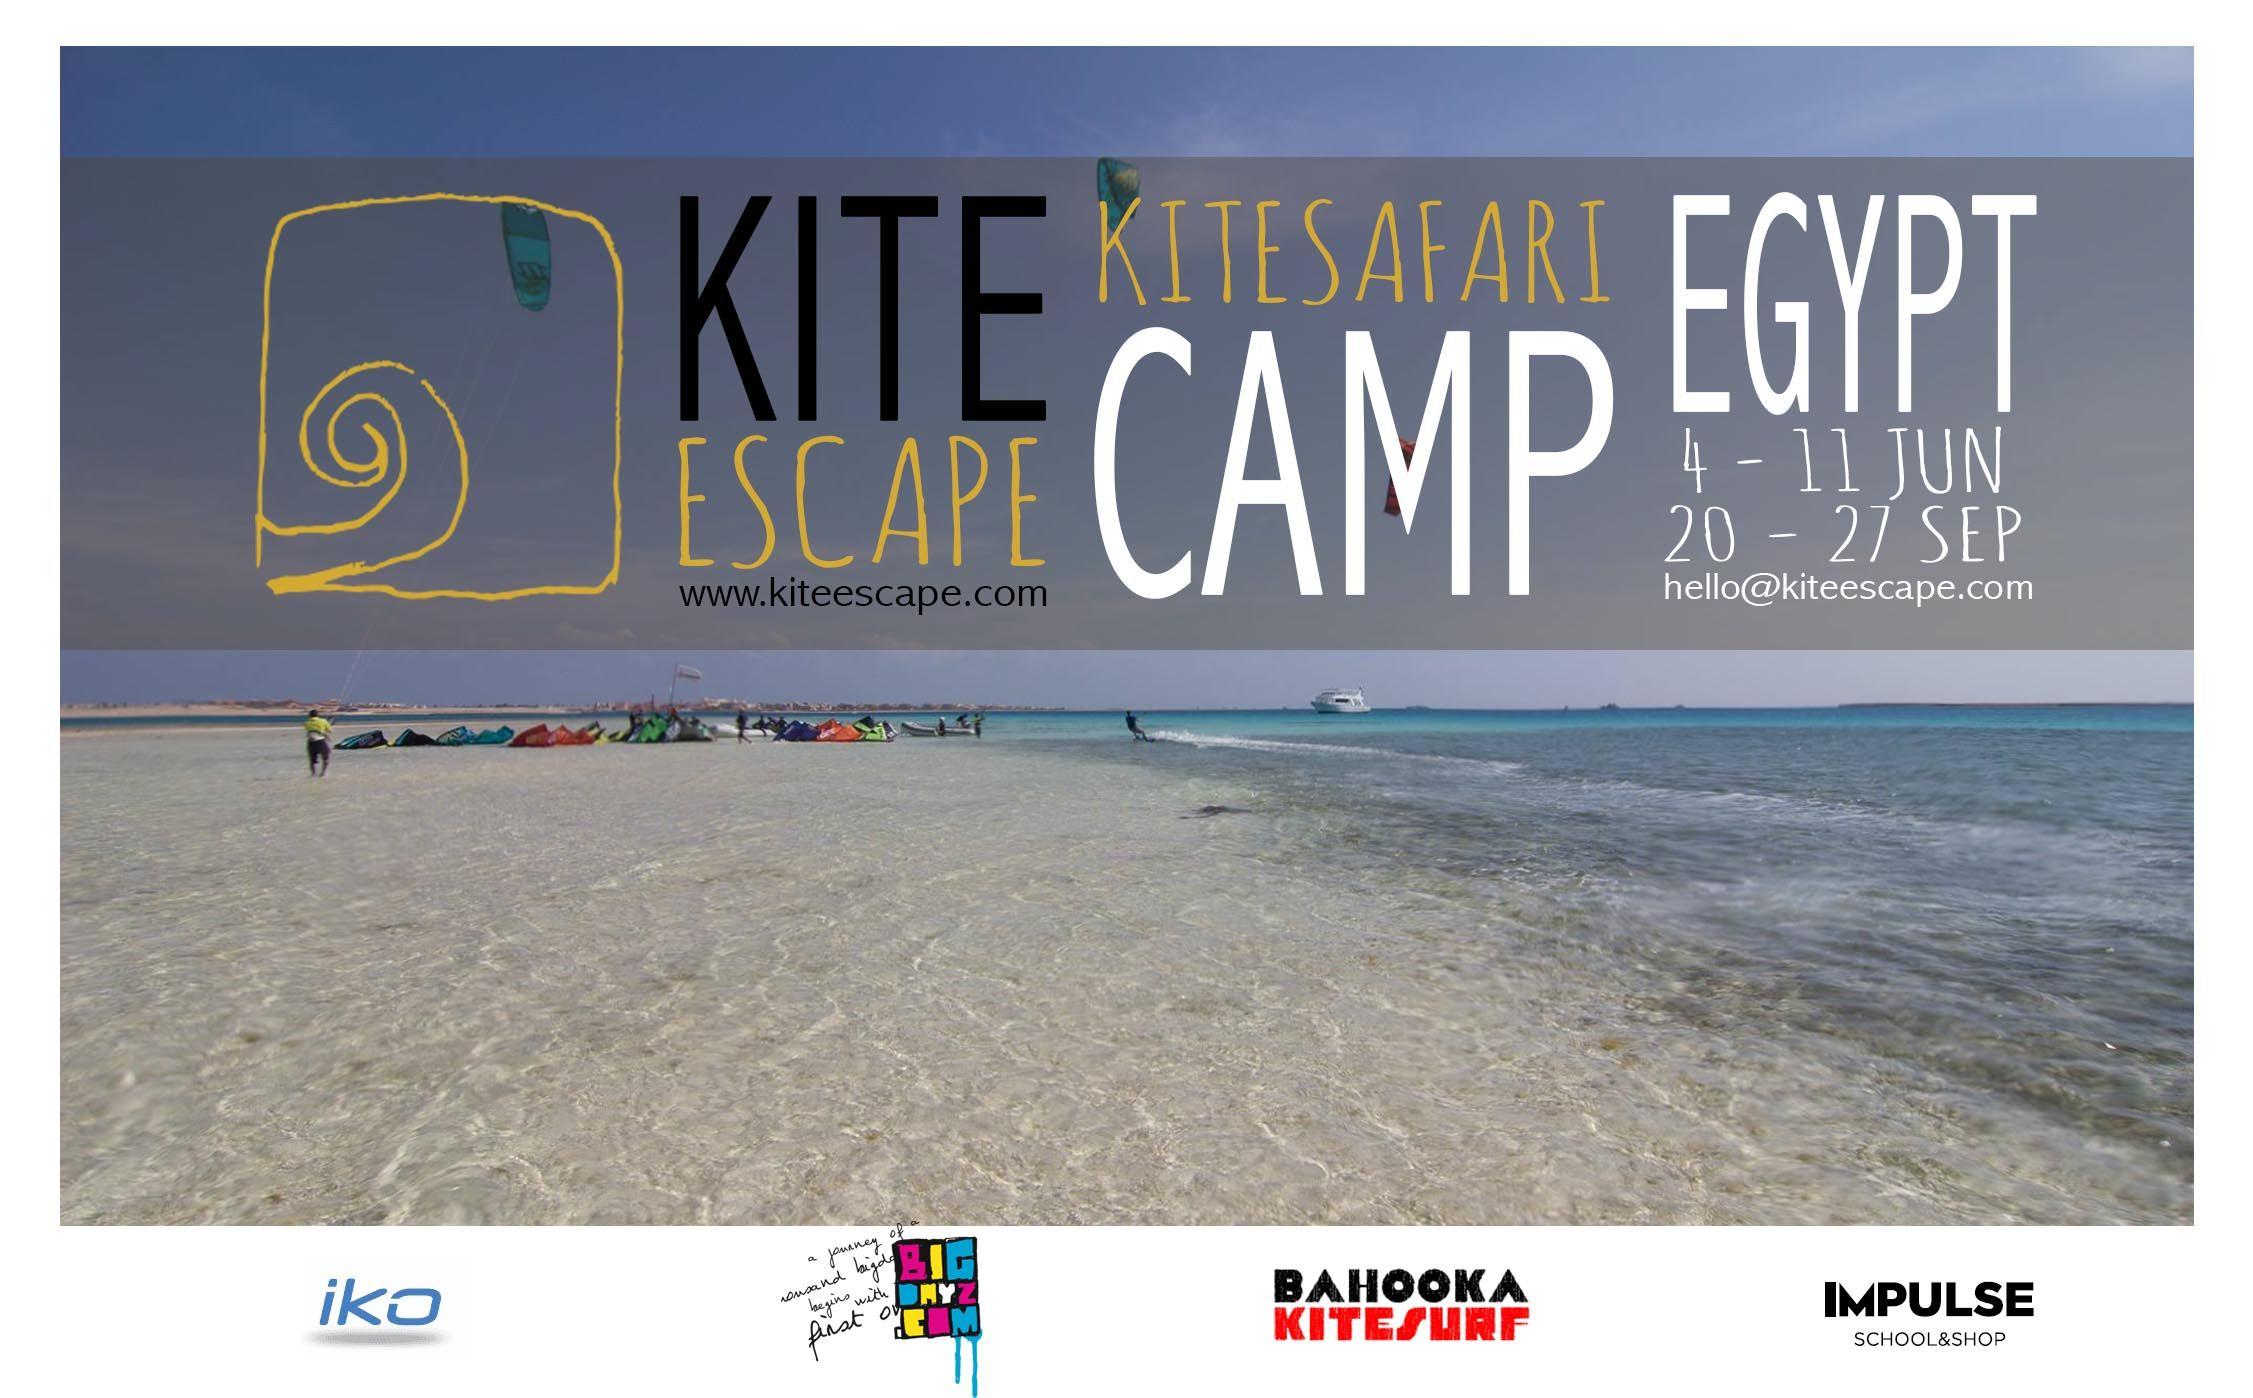 Promo flyer for kite camp in Egypt.